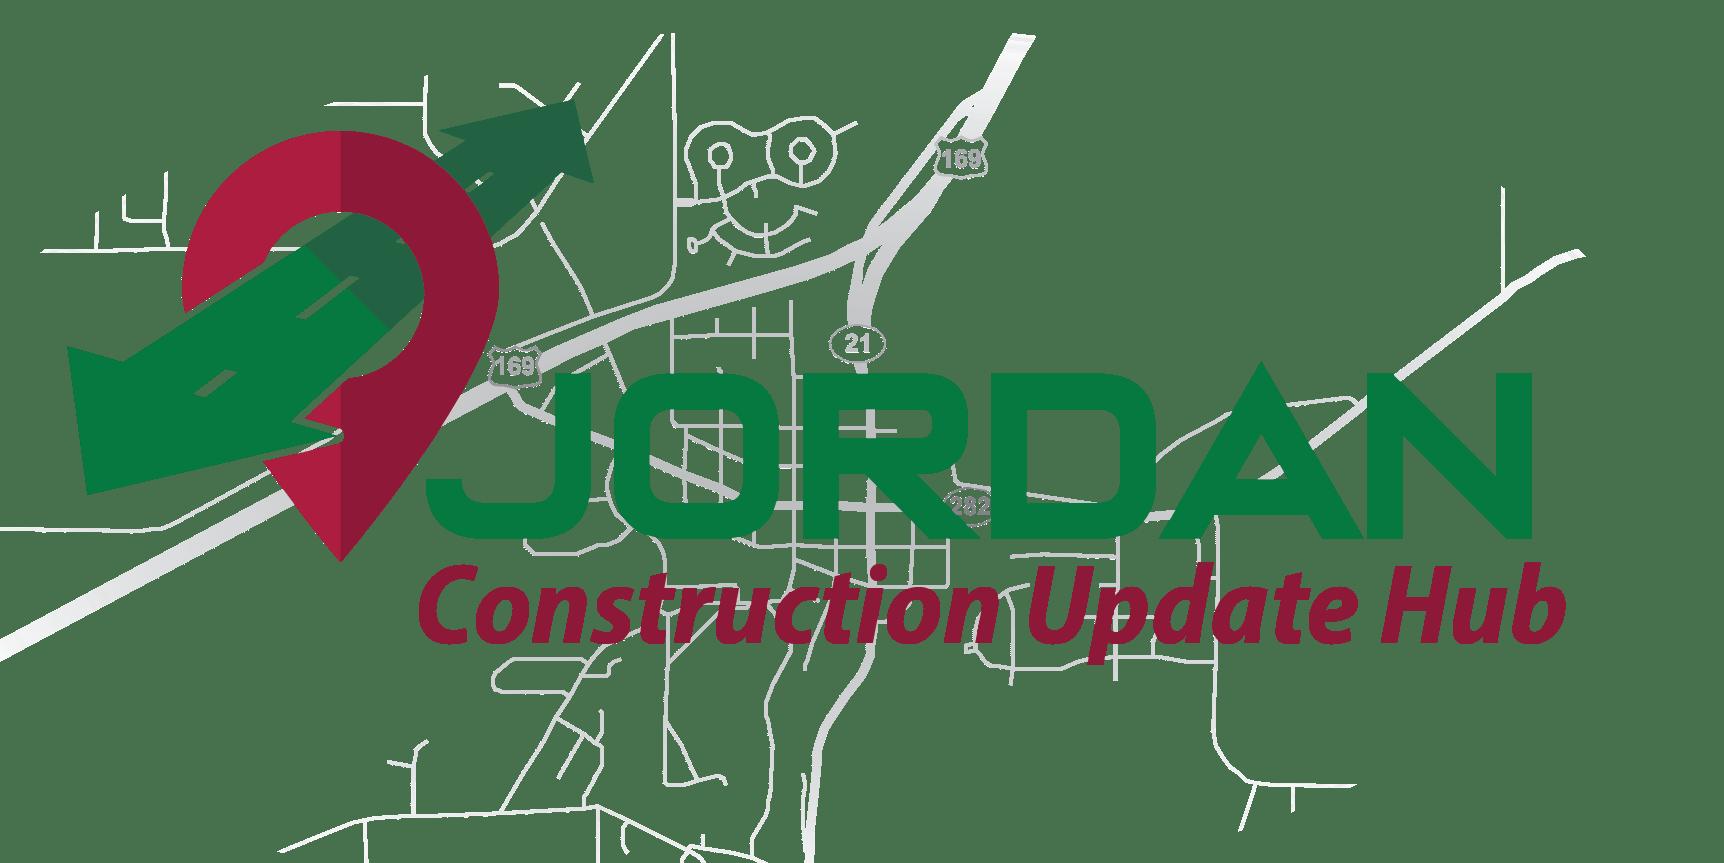 Jordan Construction Hub